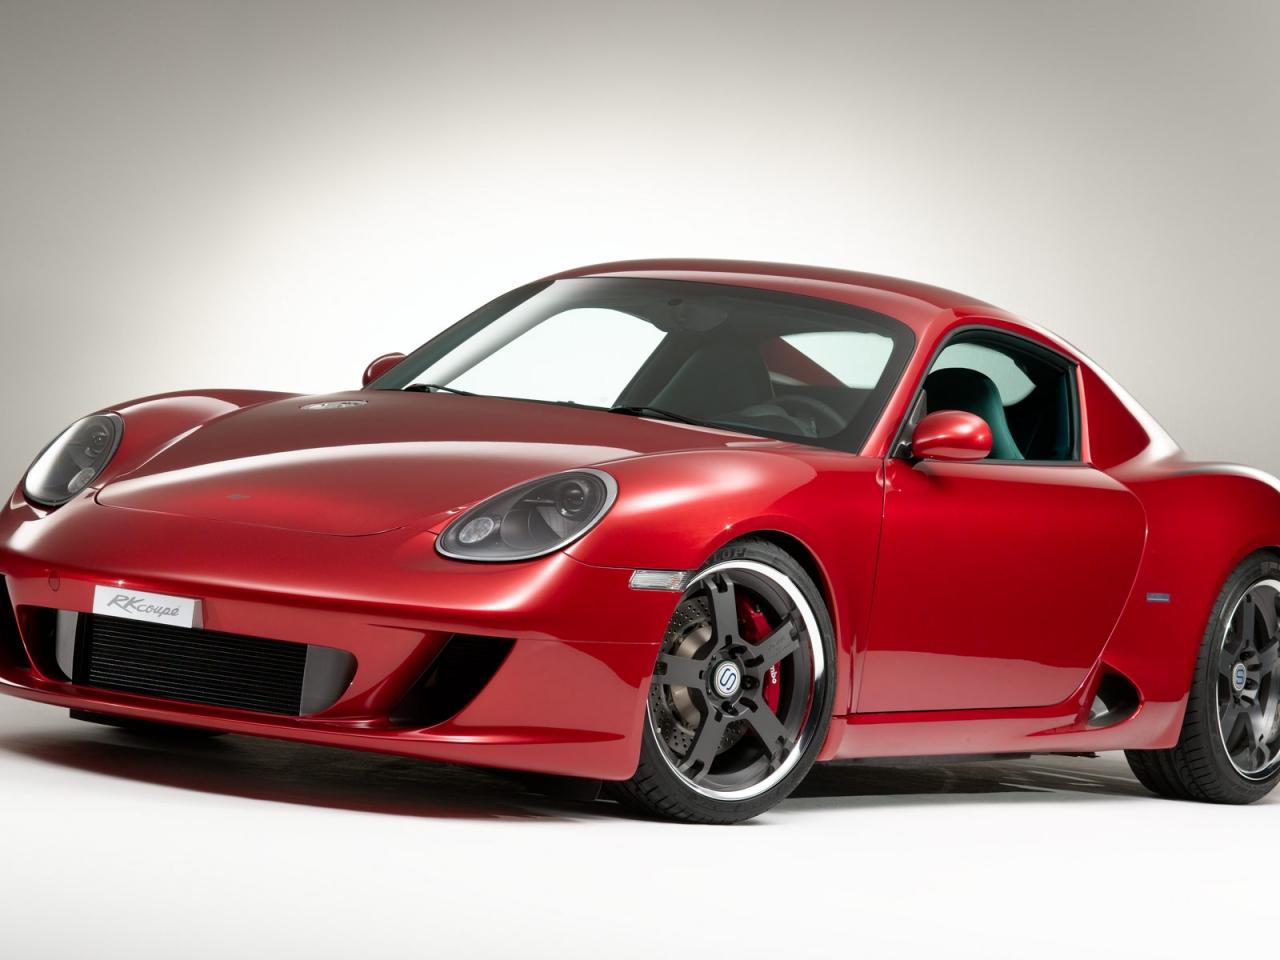 Porsche Cayman rojo - 1280x960